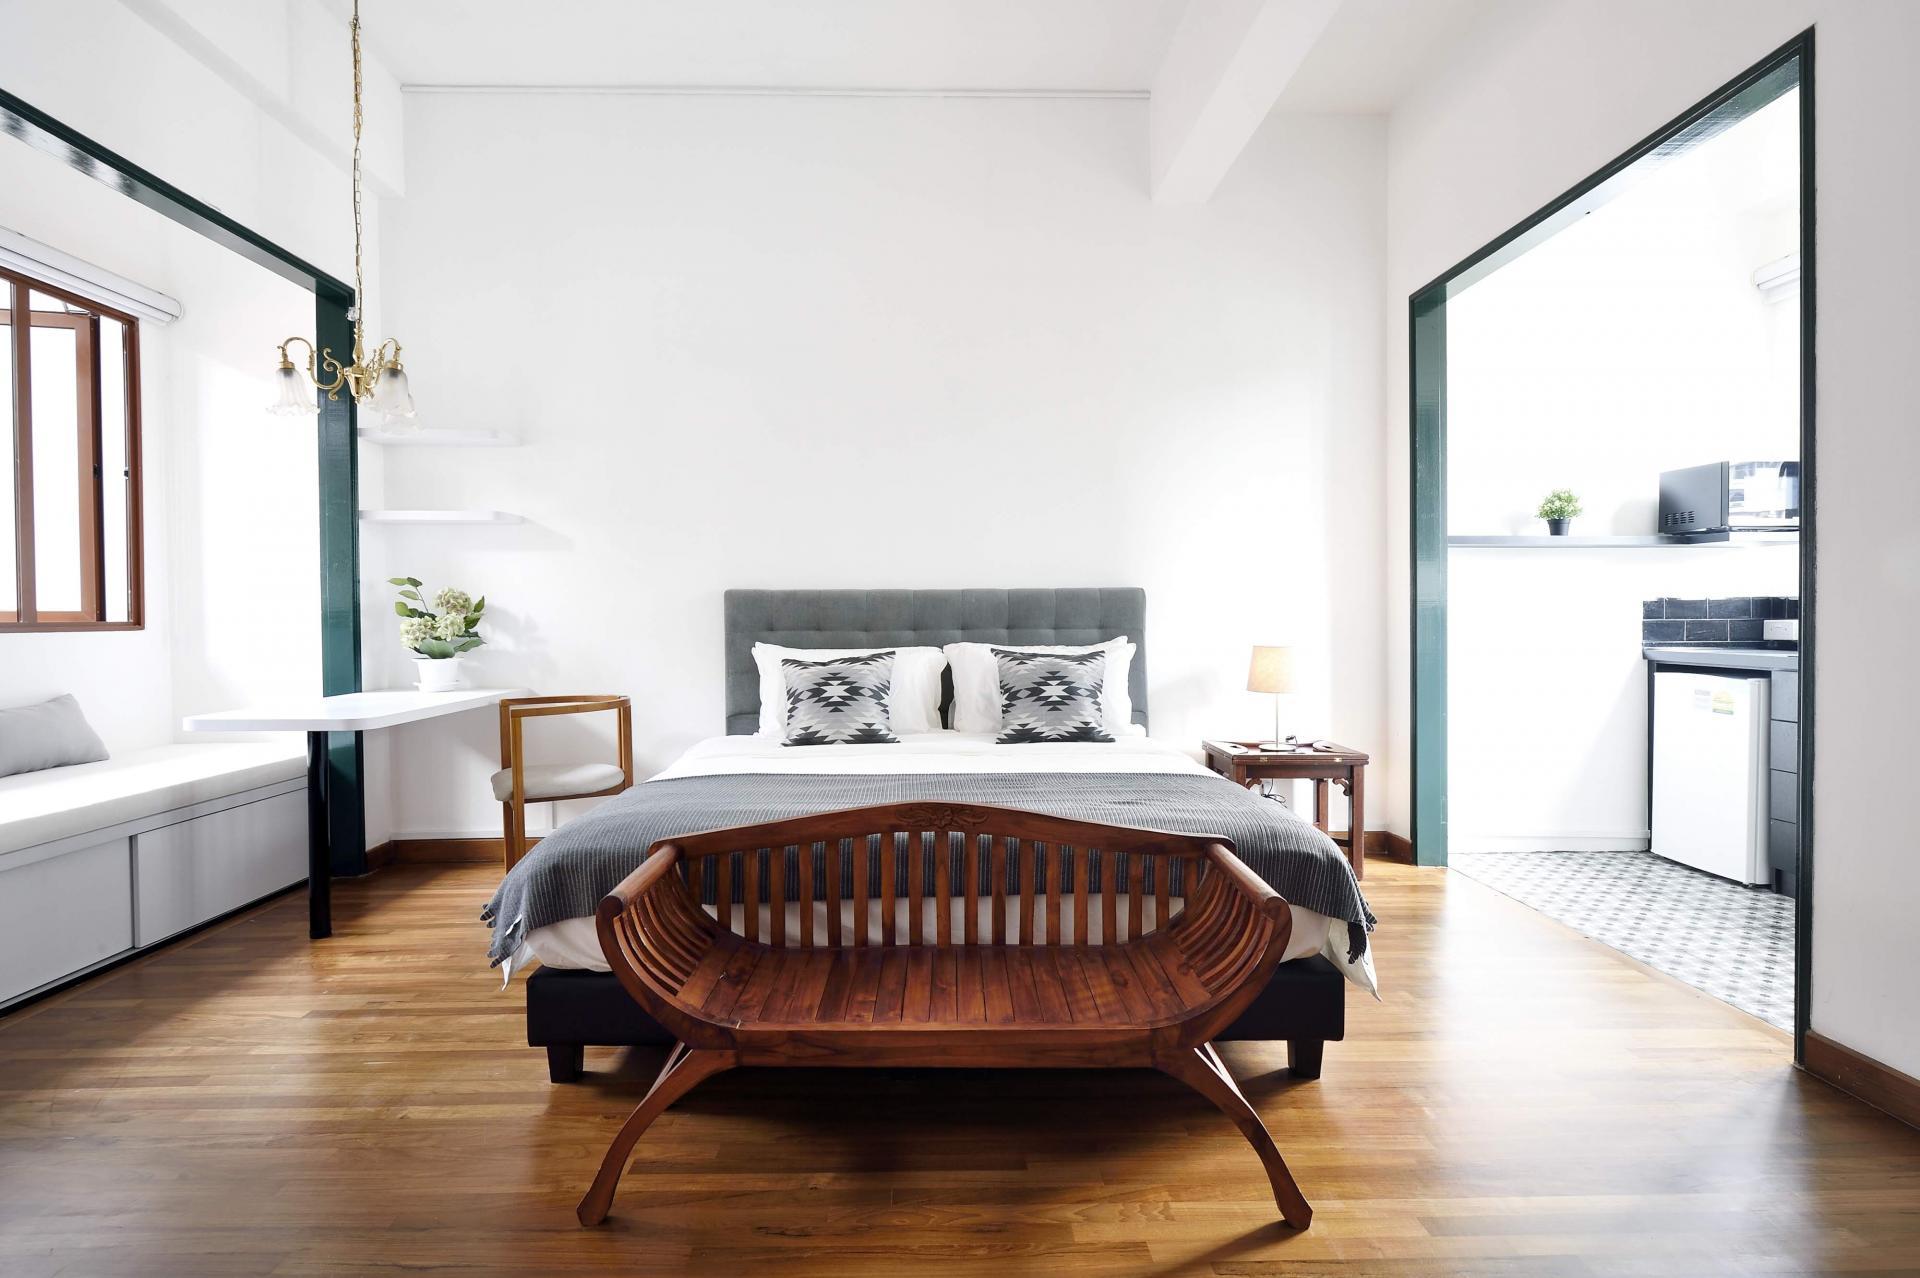 Bed at Cavenagh House Apartments, Kallang, Singapore